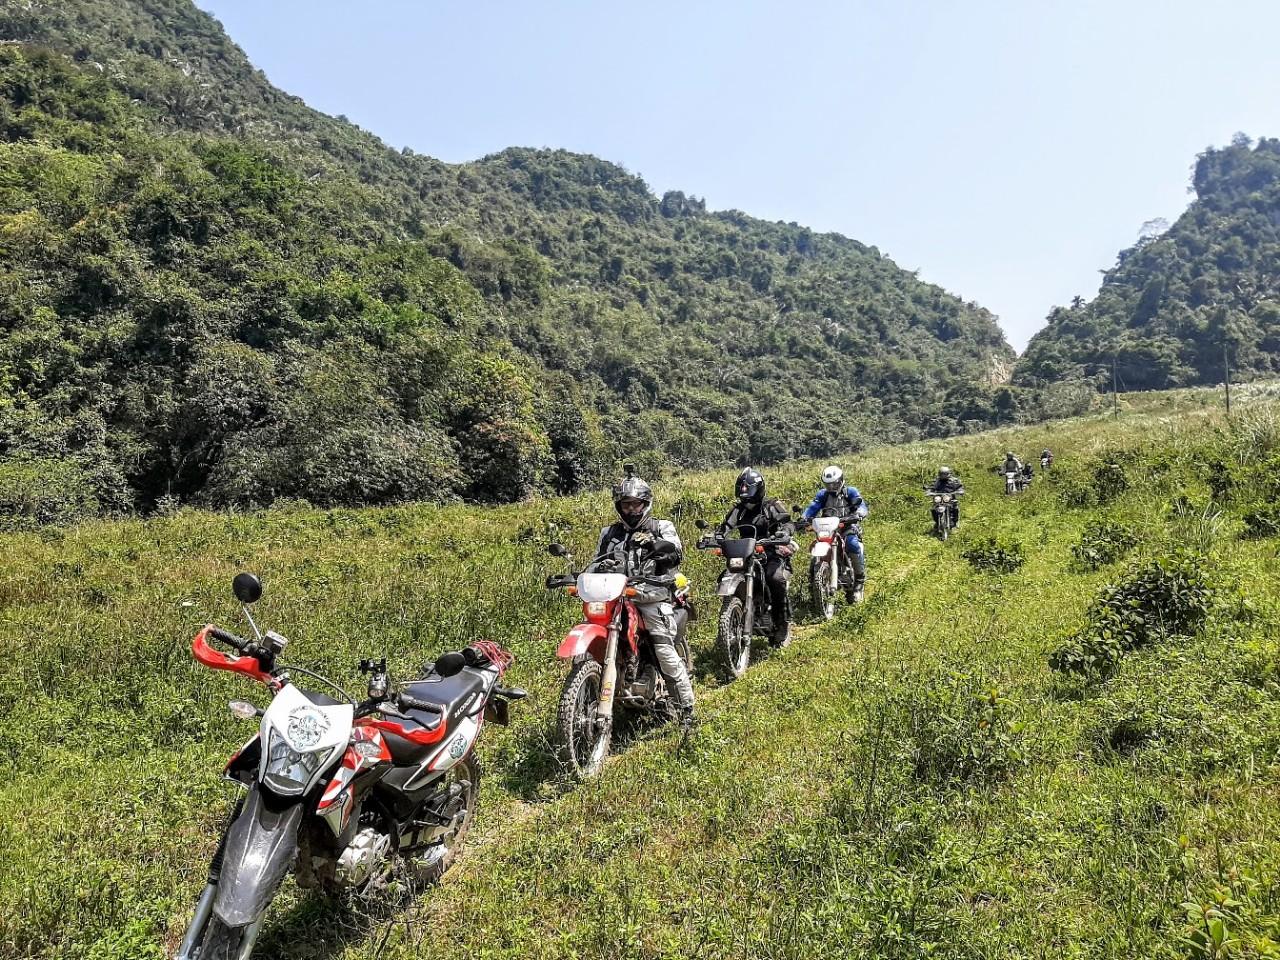 Hanoi To Saigon Motorbike Tour: 15 Days of Surprise and Adventurous